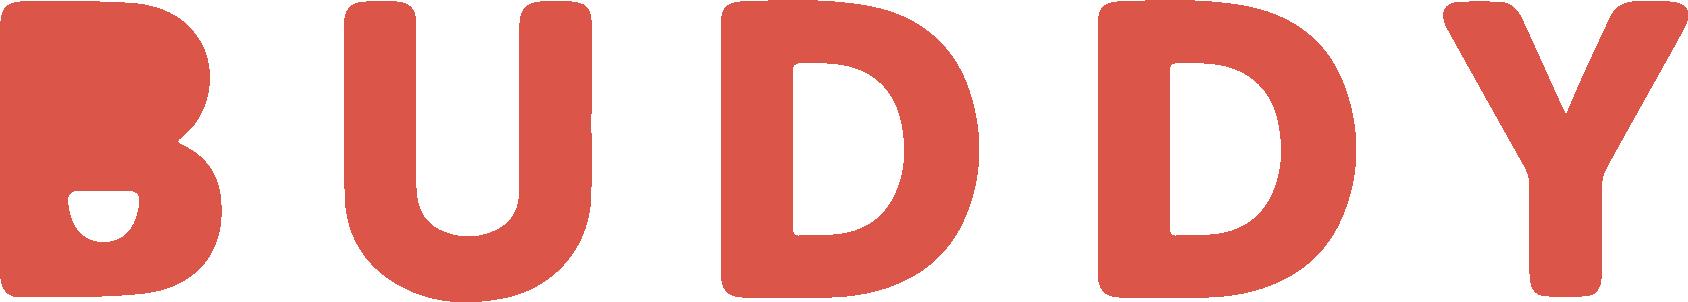 buddy insurance logo